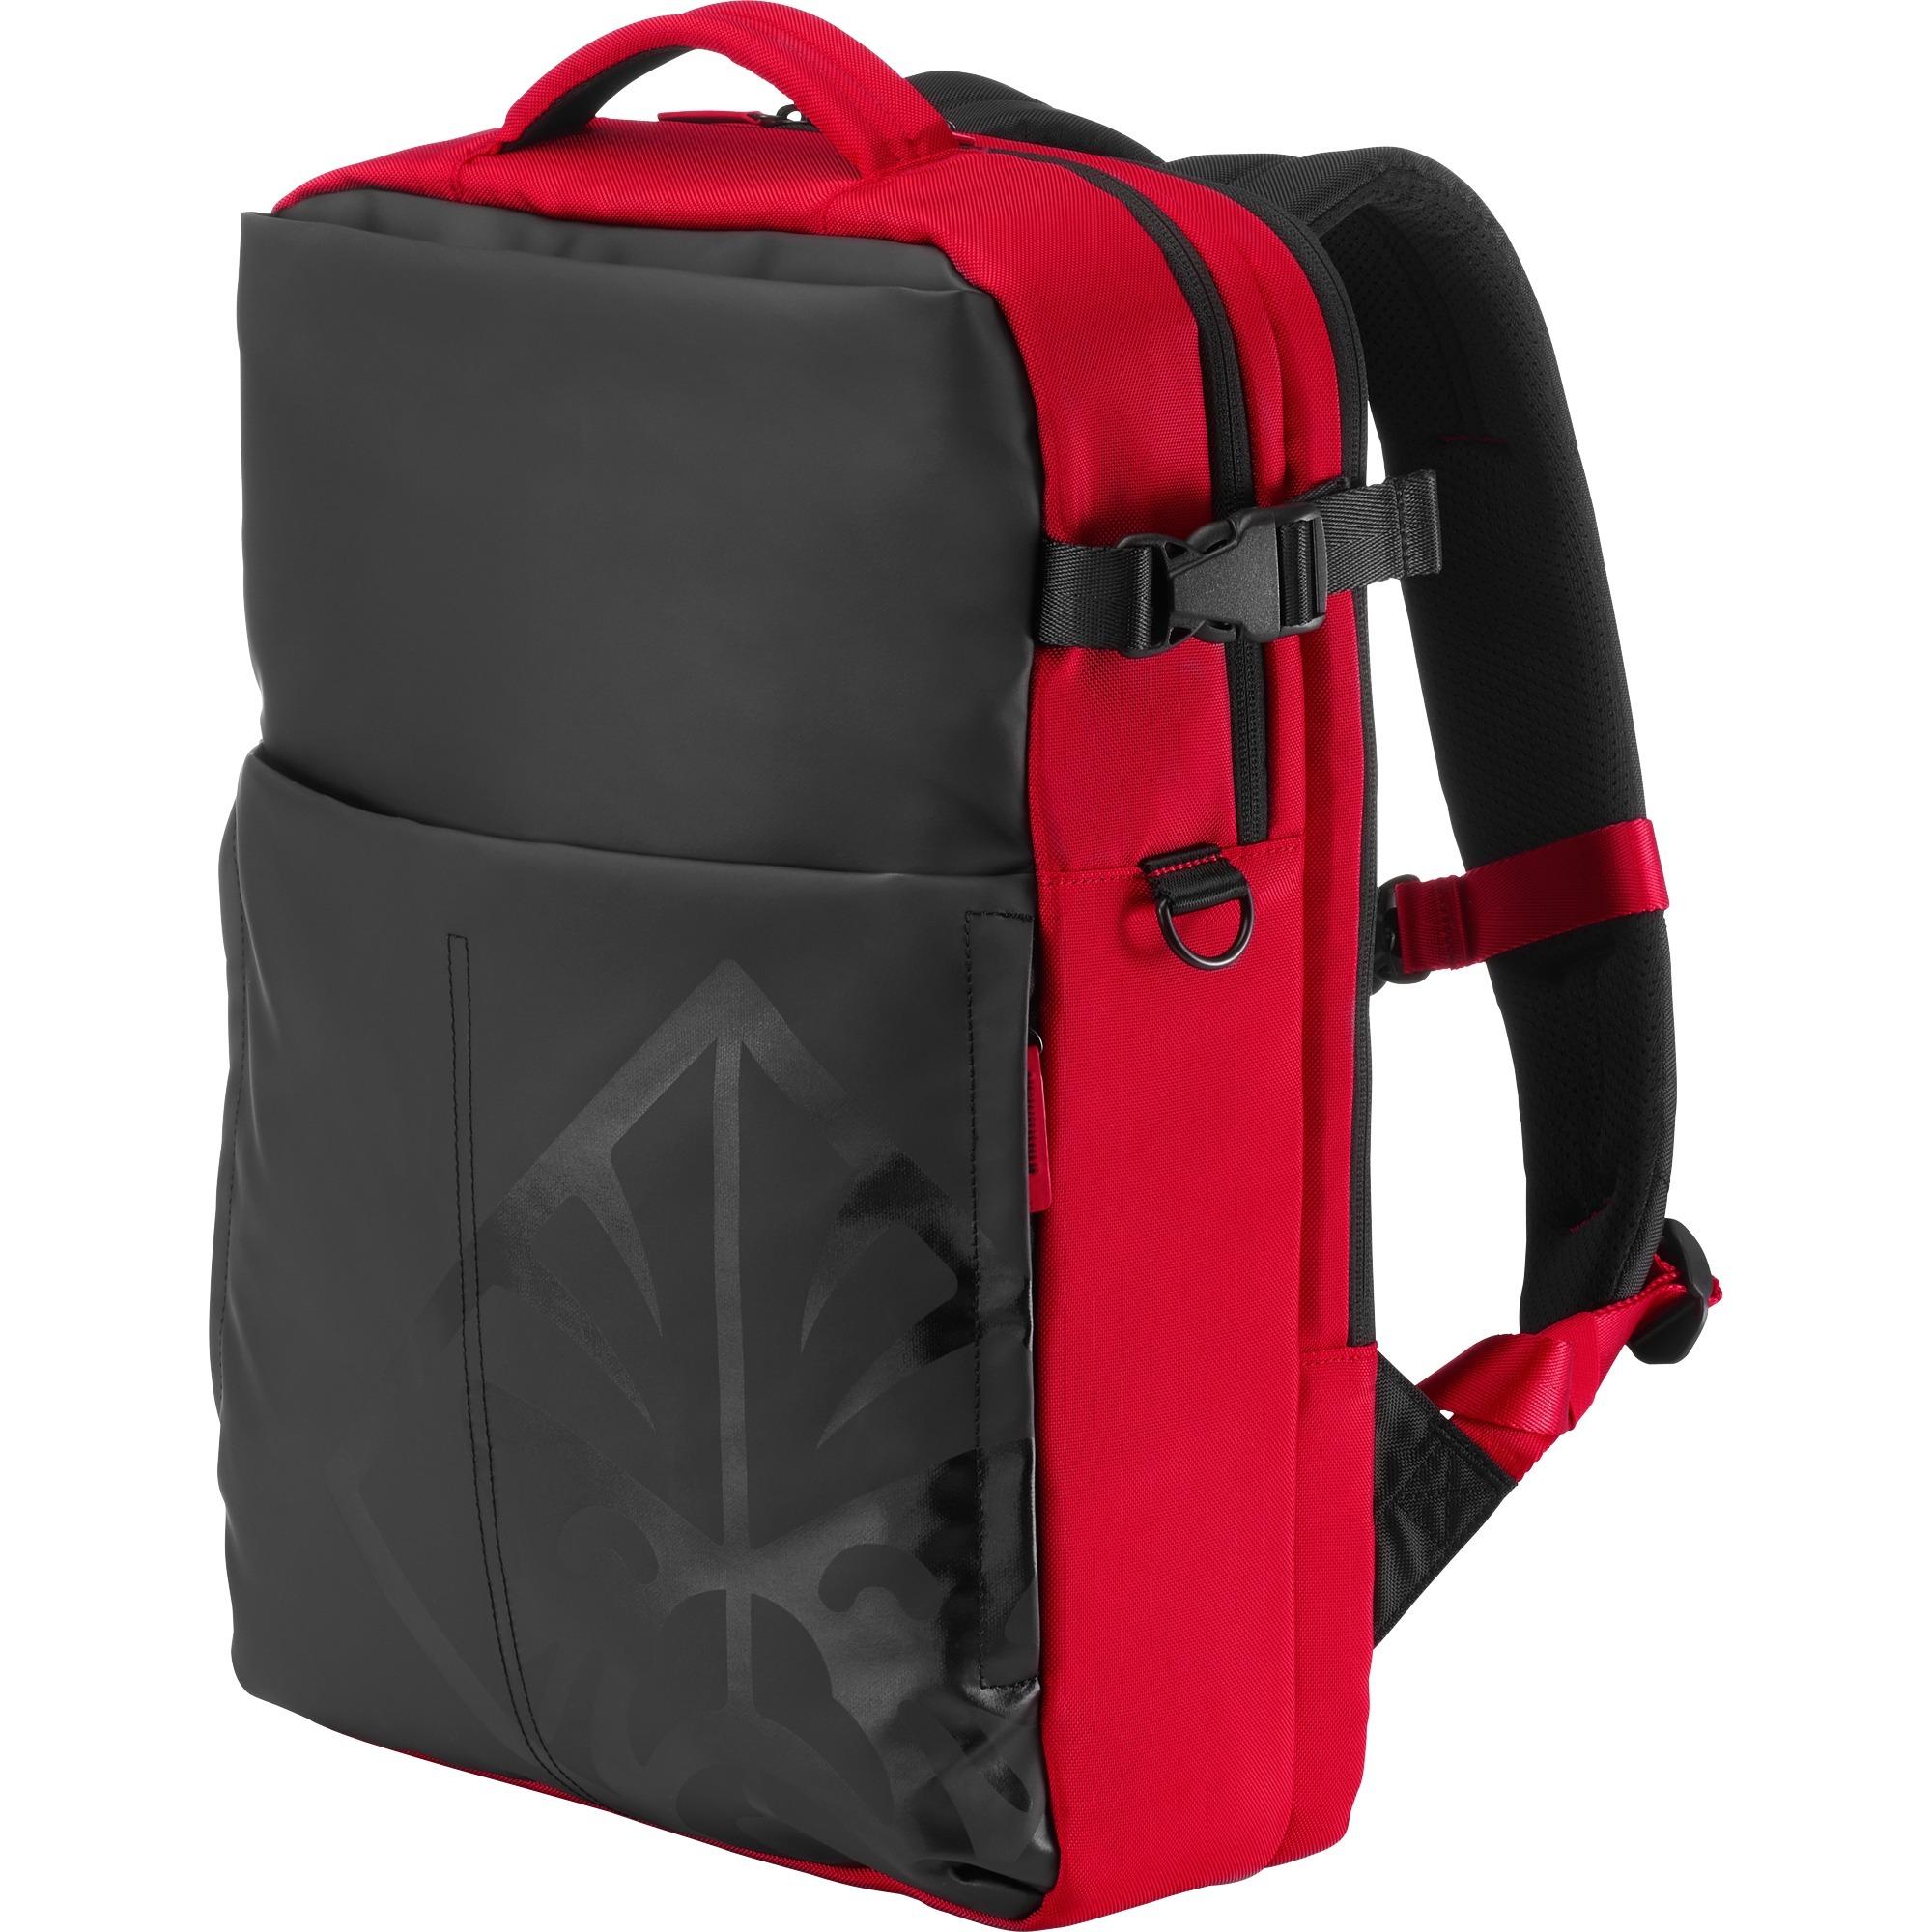 "OMEN maletines para portátil 43,9 cm (17.3"") Mochila Negro, Rojo"